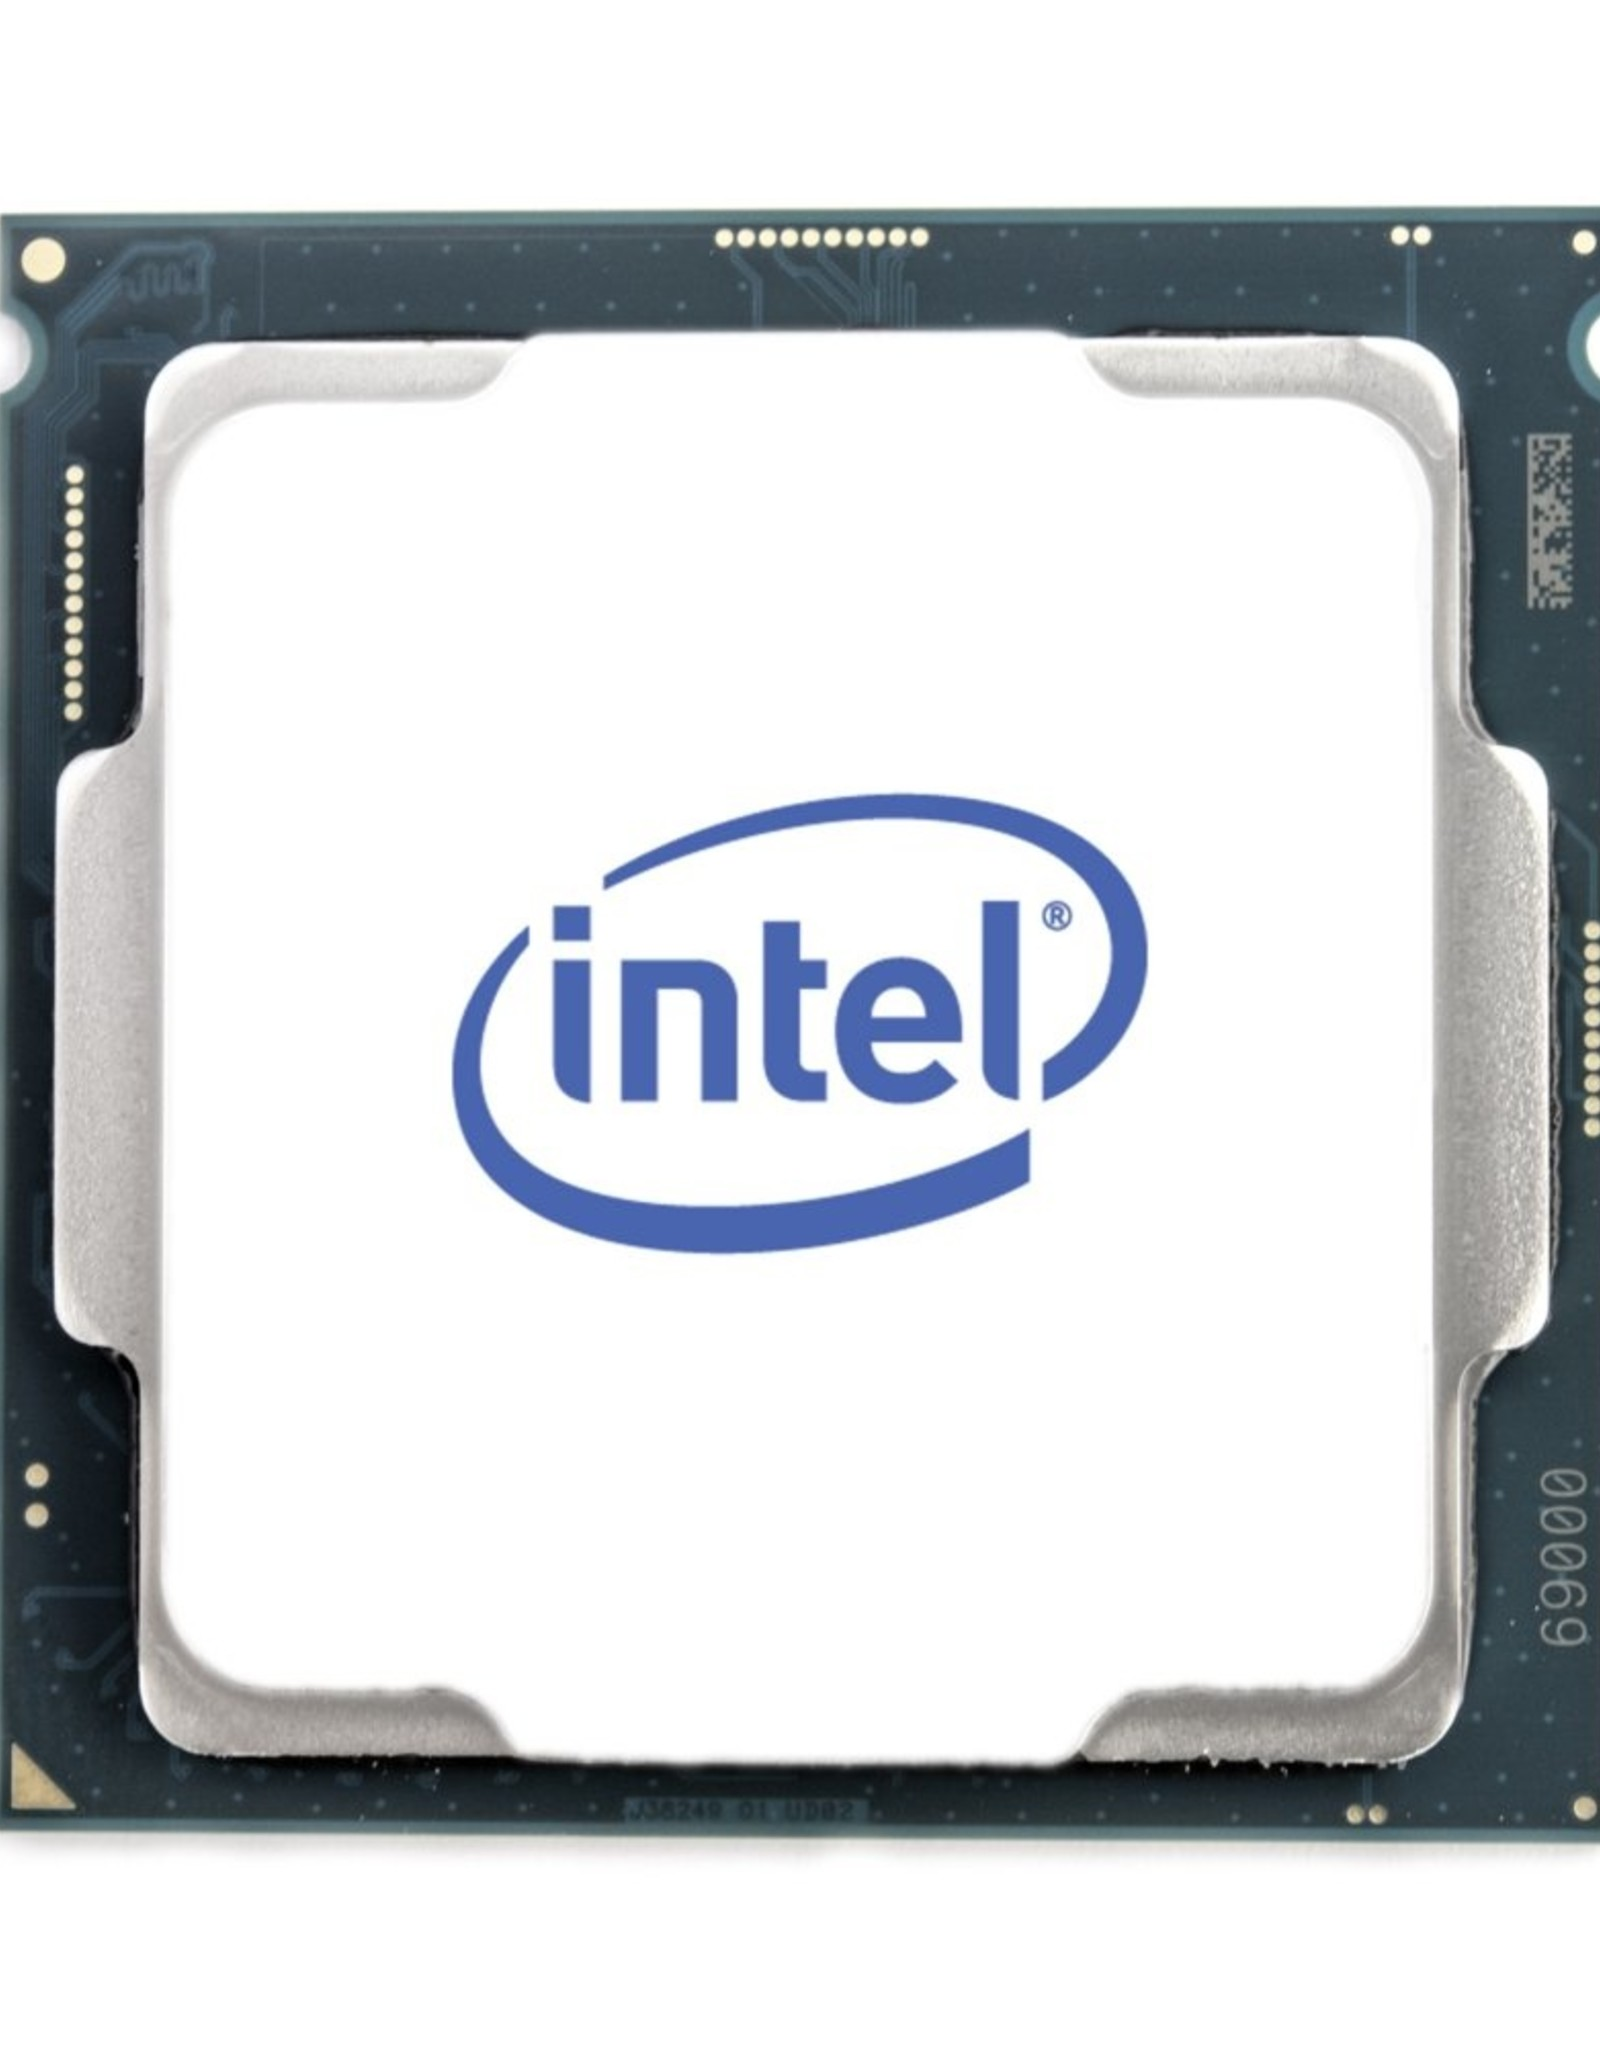 CPU ® Core™ i7-8700 8th 3.2-4.6Ghz 6core LGA1151v2 Tray